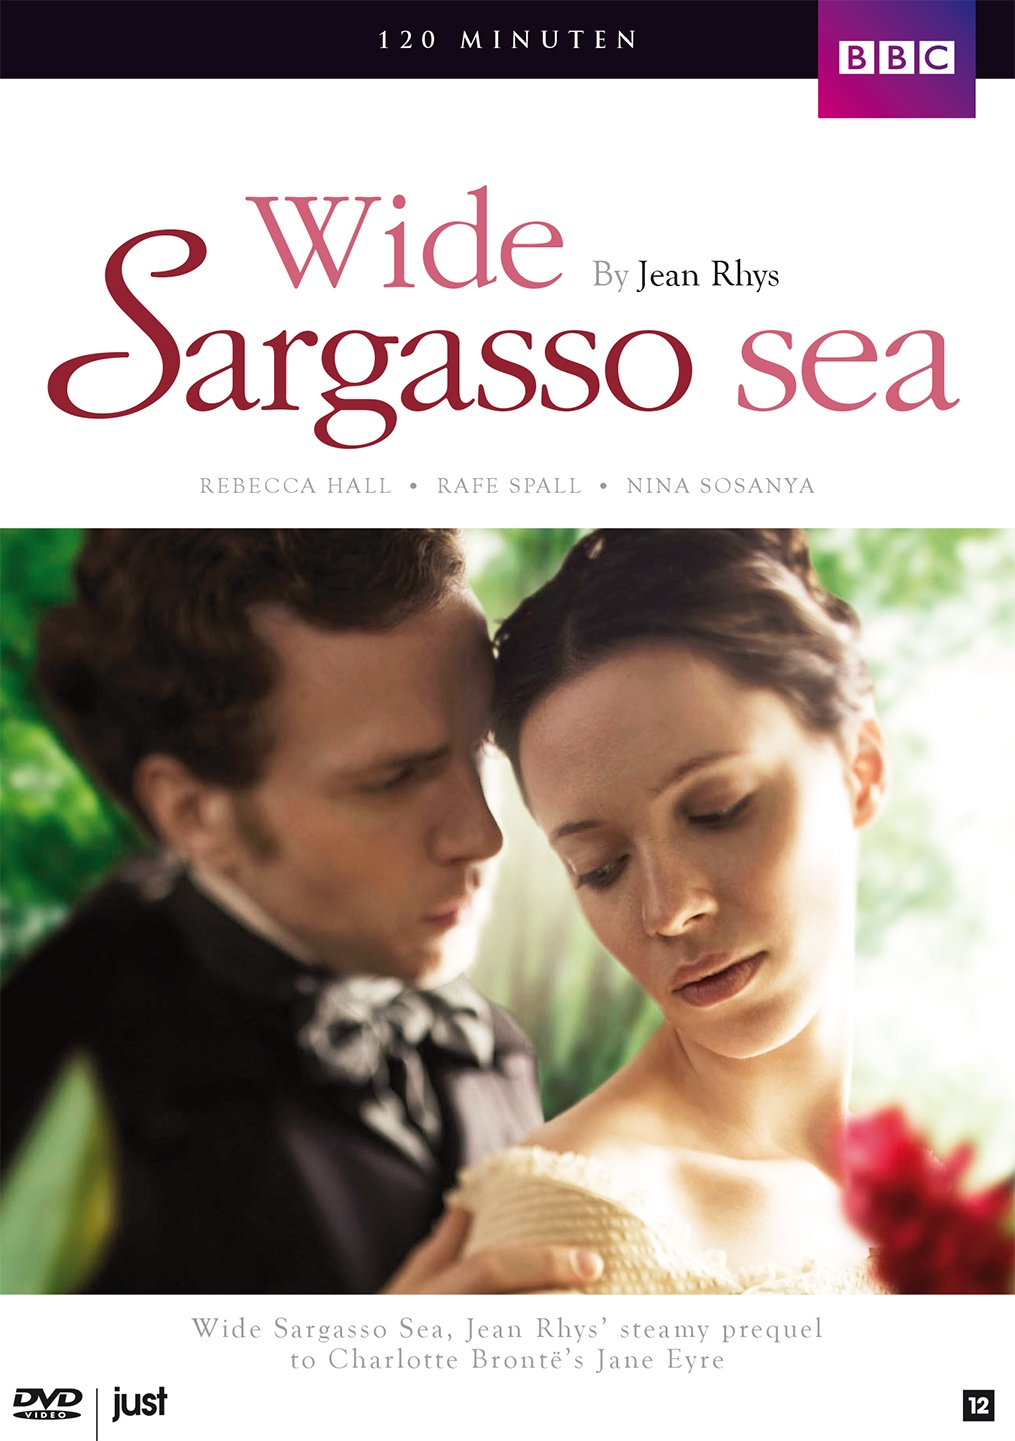 jean rhys wide sargasso sea readers guides to essential dvd wide sargasso sea bbc region 2 english audio